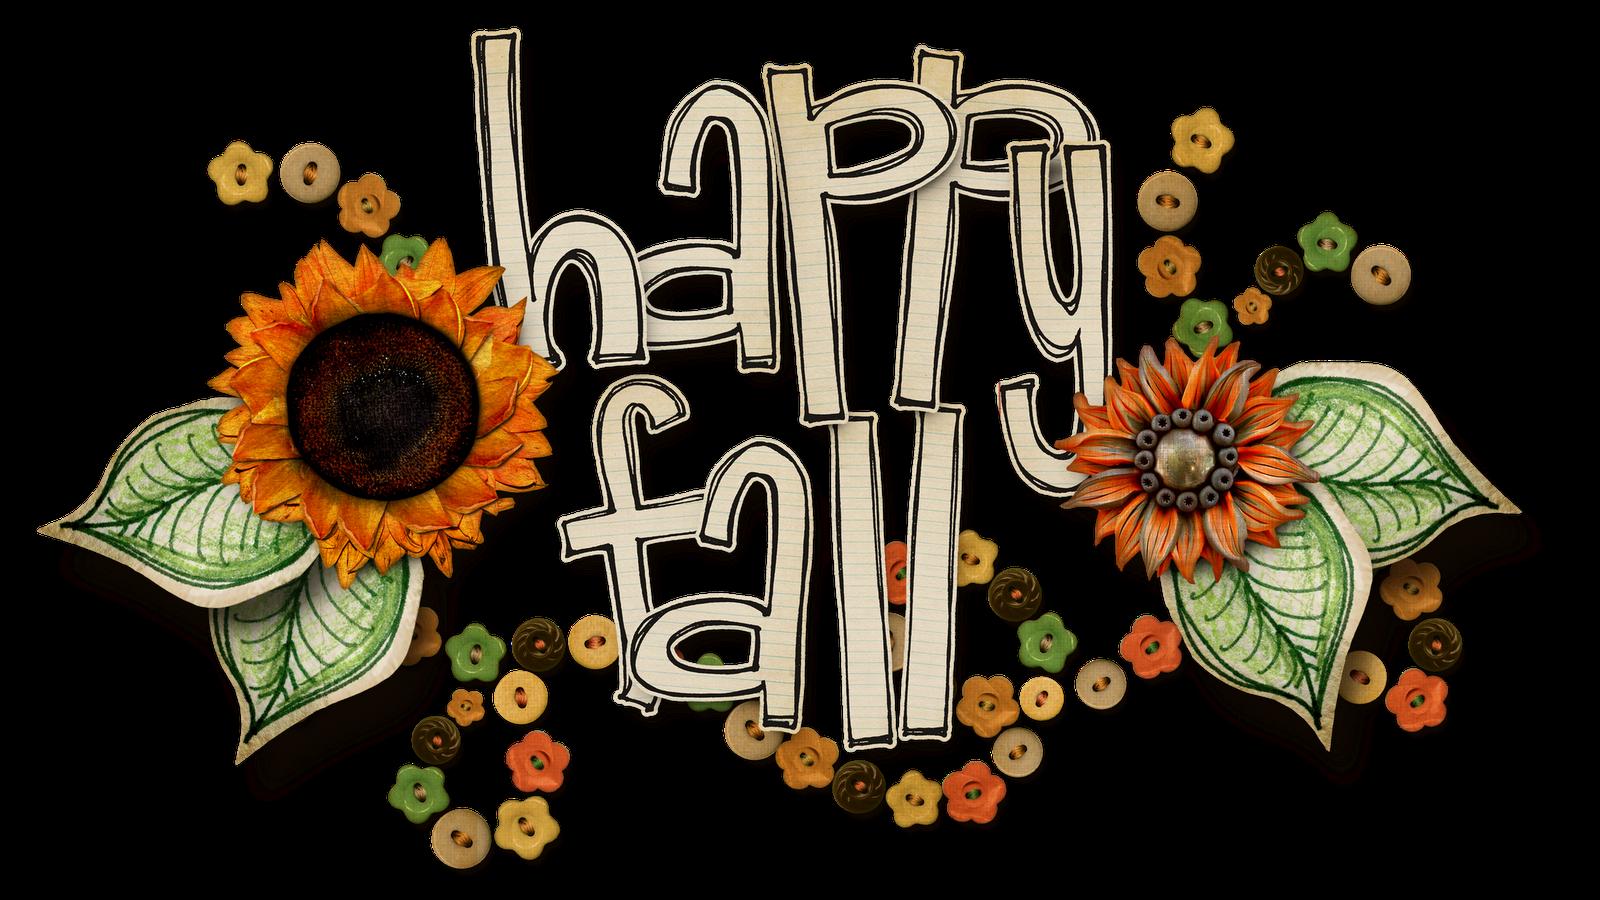 Fall day clip art. Autumn clipart autumn word